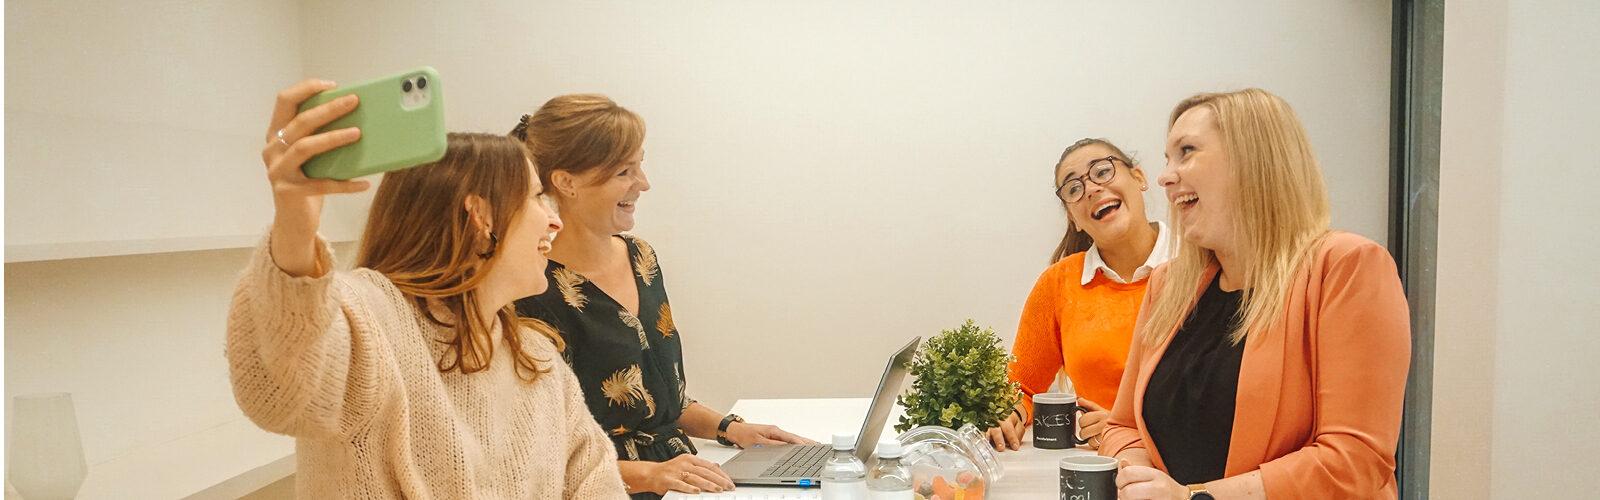 recrewtment-team-rekrutering-selectie-rekruteringspartner-hr